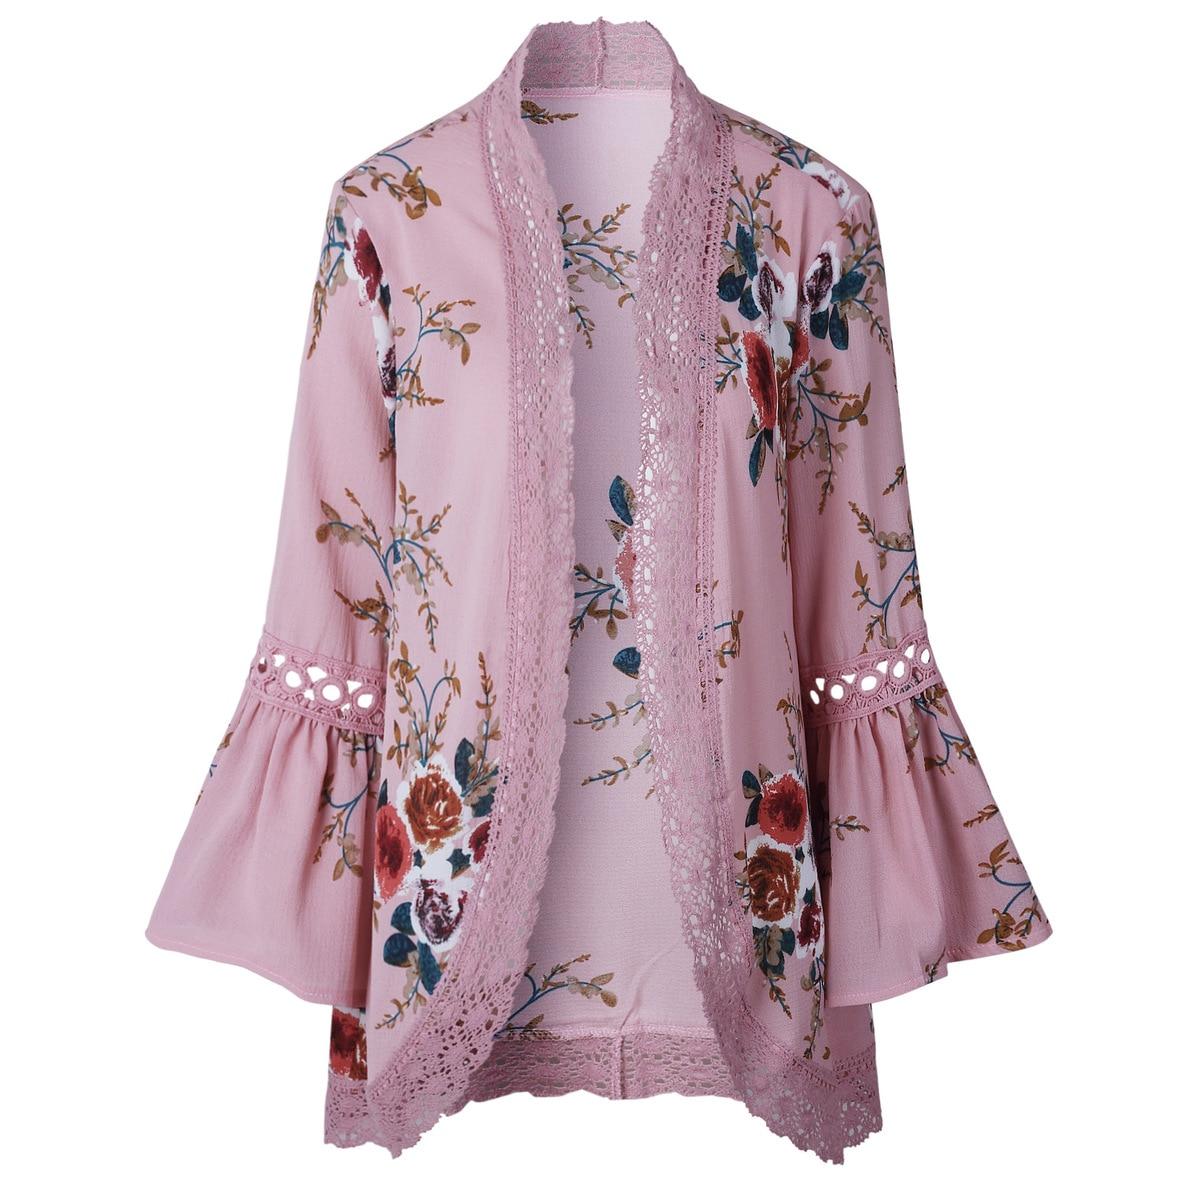 HTB1.T1JEkKWBuNjy1zjq6AOypXa0 Women Plus Size Loose Casual Basic Jackets Female 2018 Autumn Long Flare Sleeve Floral Print Outwear Coat Open Stitch Clothing